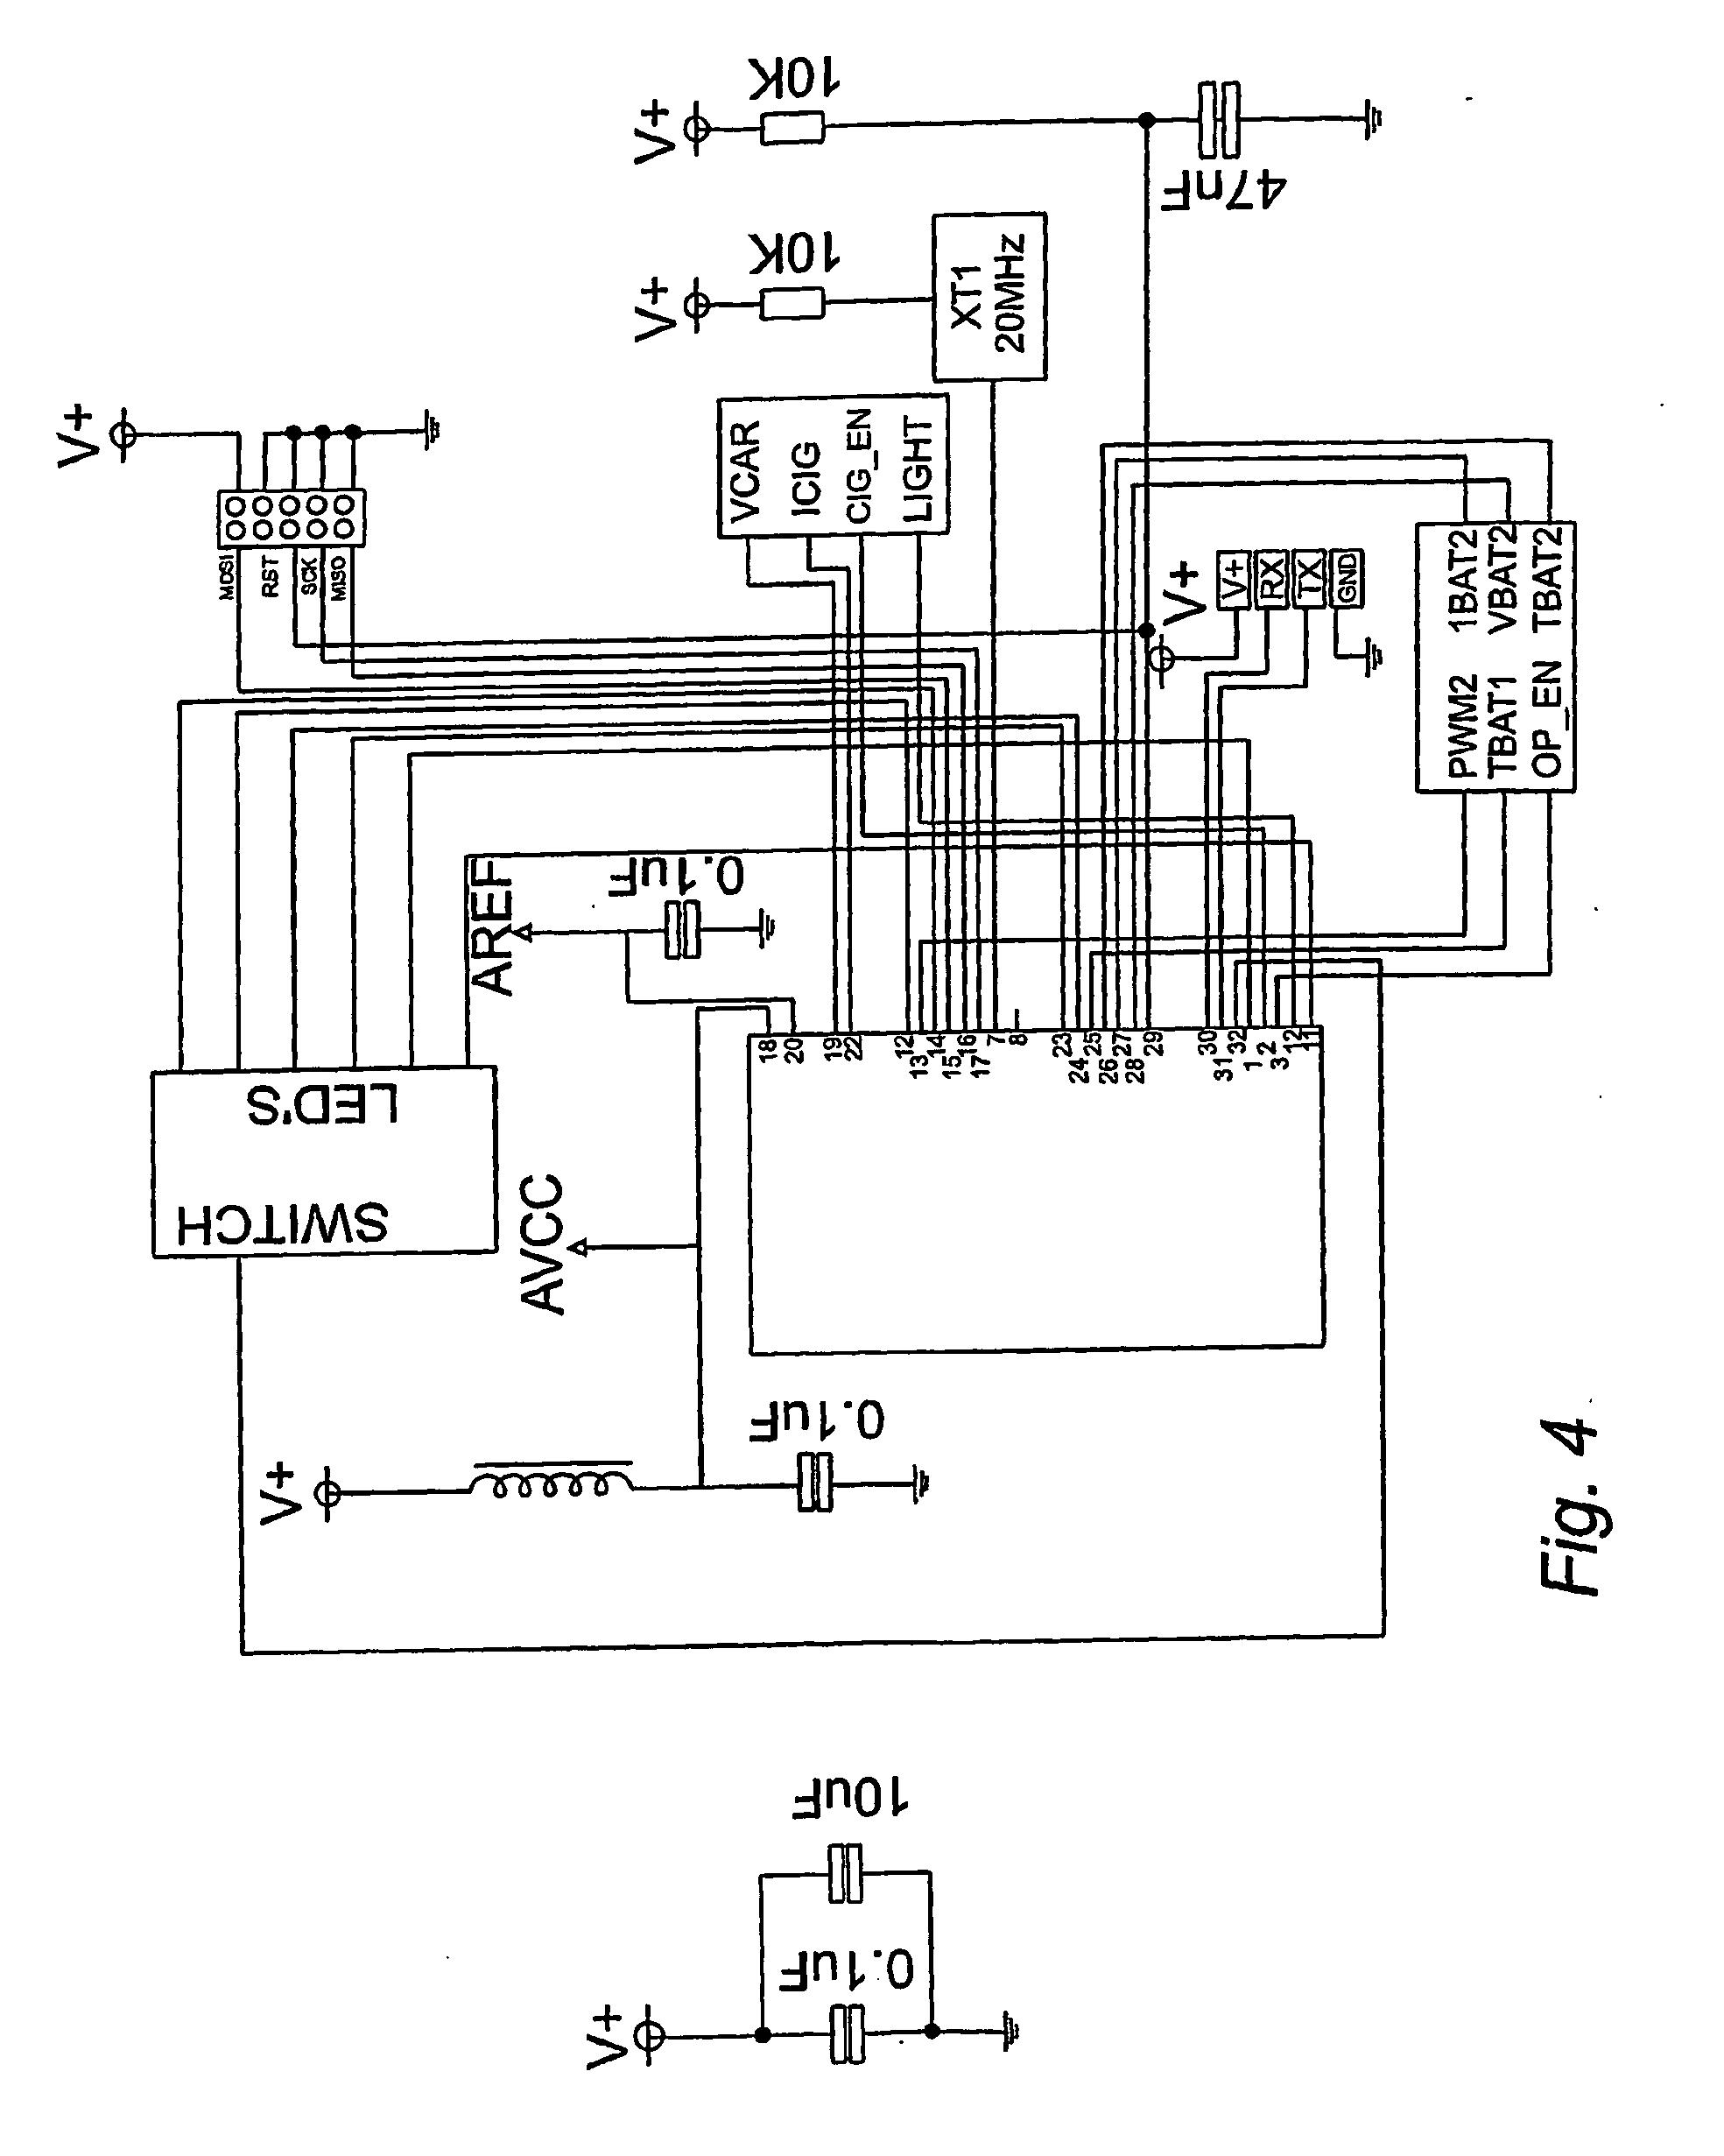 Resistor Wiring Diagram Legend Diagrams Modbus Golf Cart 31 Images End Line 485 Terminating Location